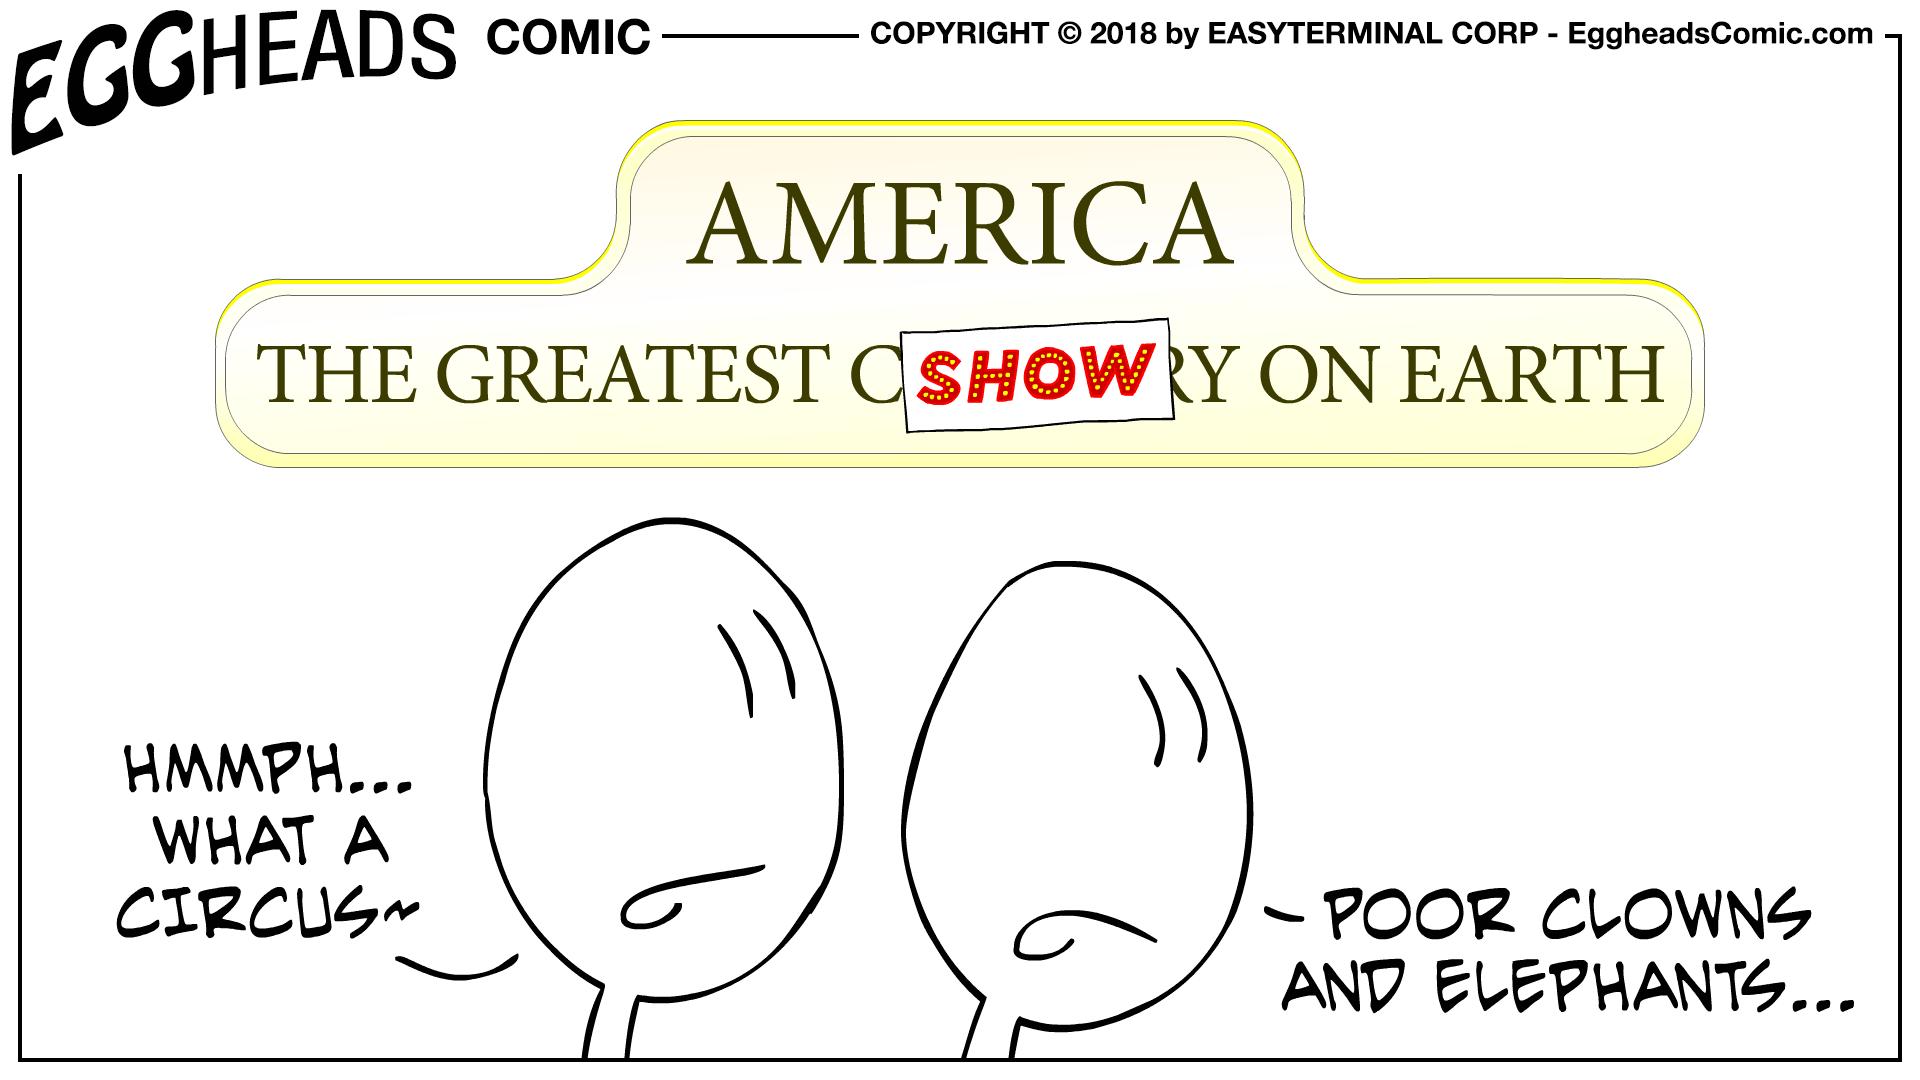 Webcomic Eggheads Comic Strip 094 America